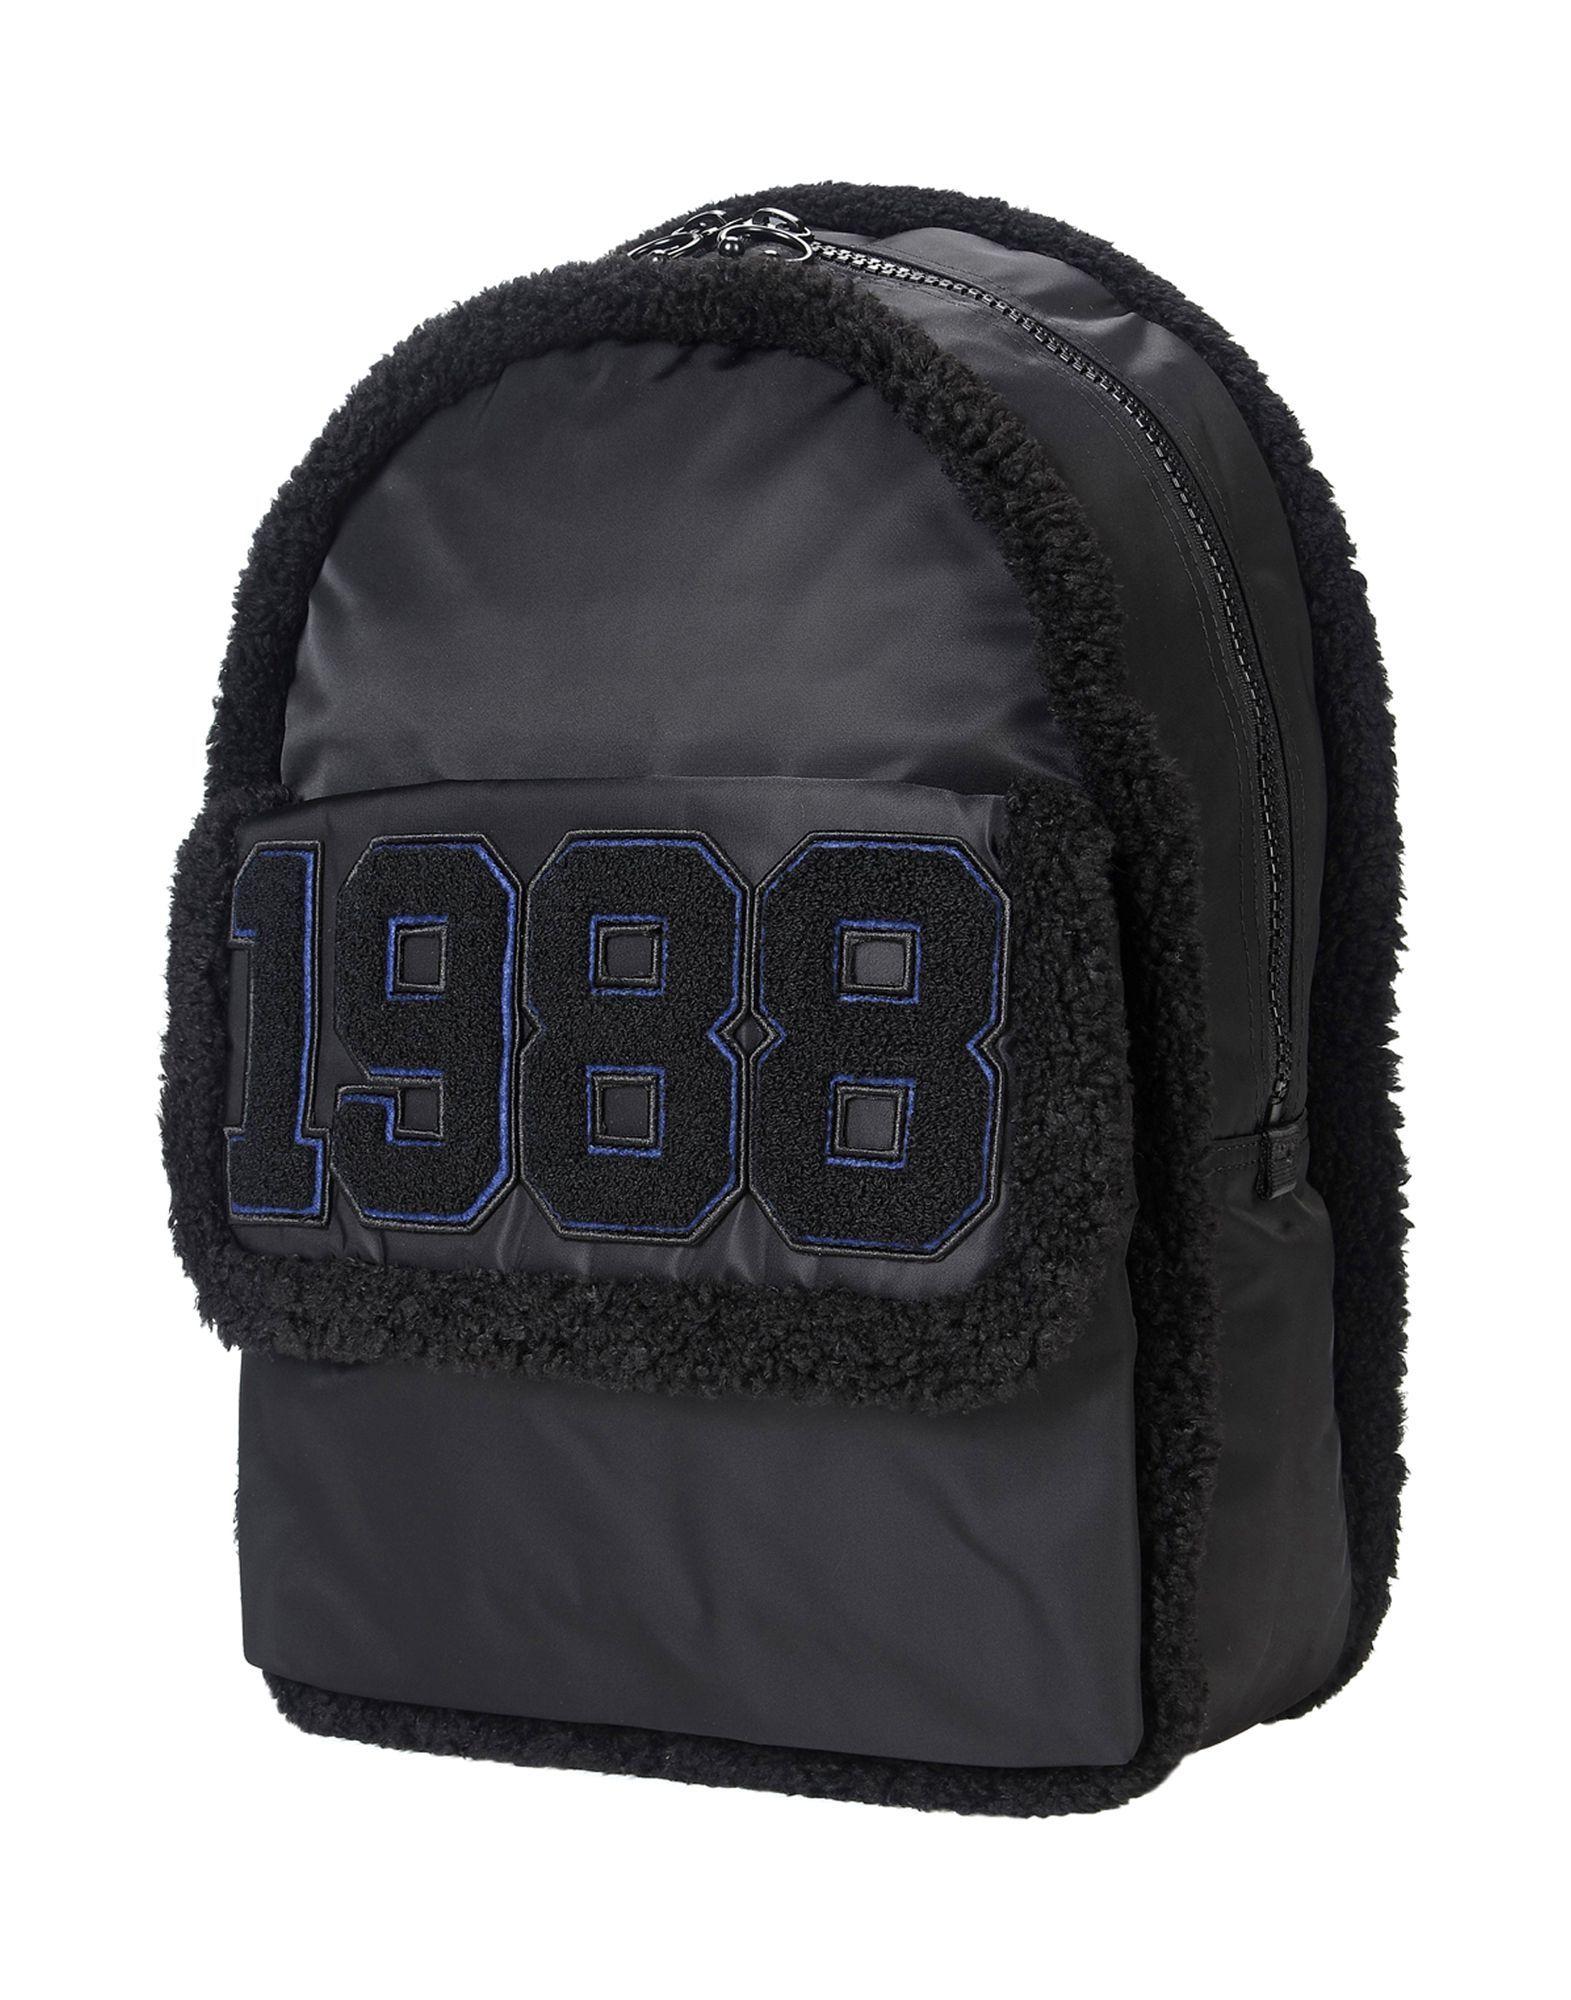 01616a50e7 FENTY X PUMA .  fentyxpuma  bags  polyester  nylon  backpacks ...